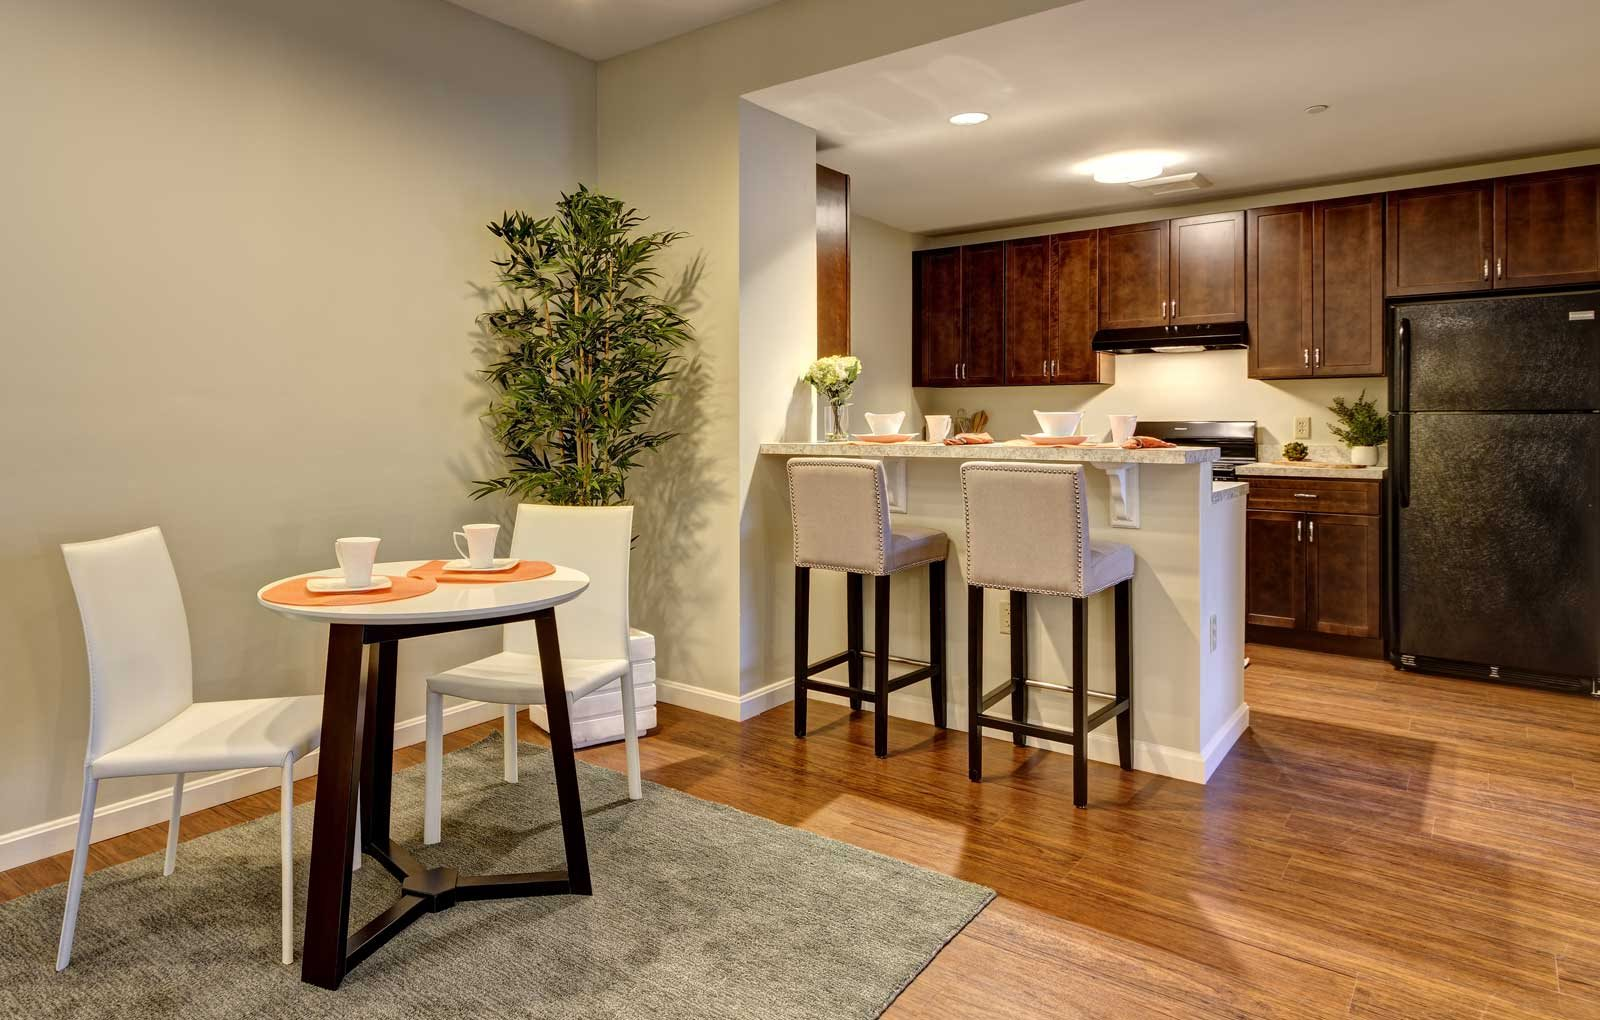 Apartments feature modern design